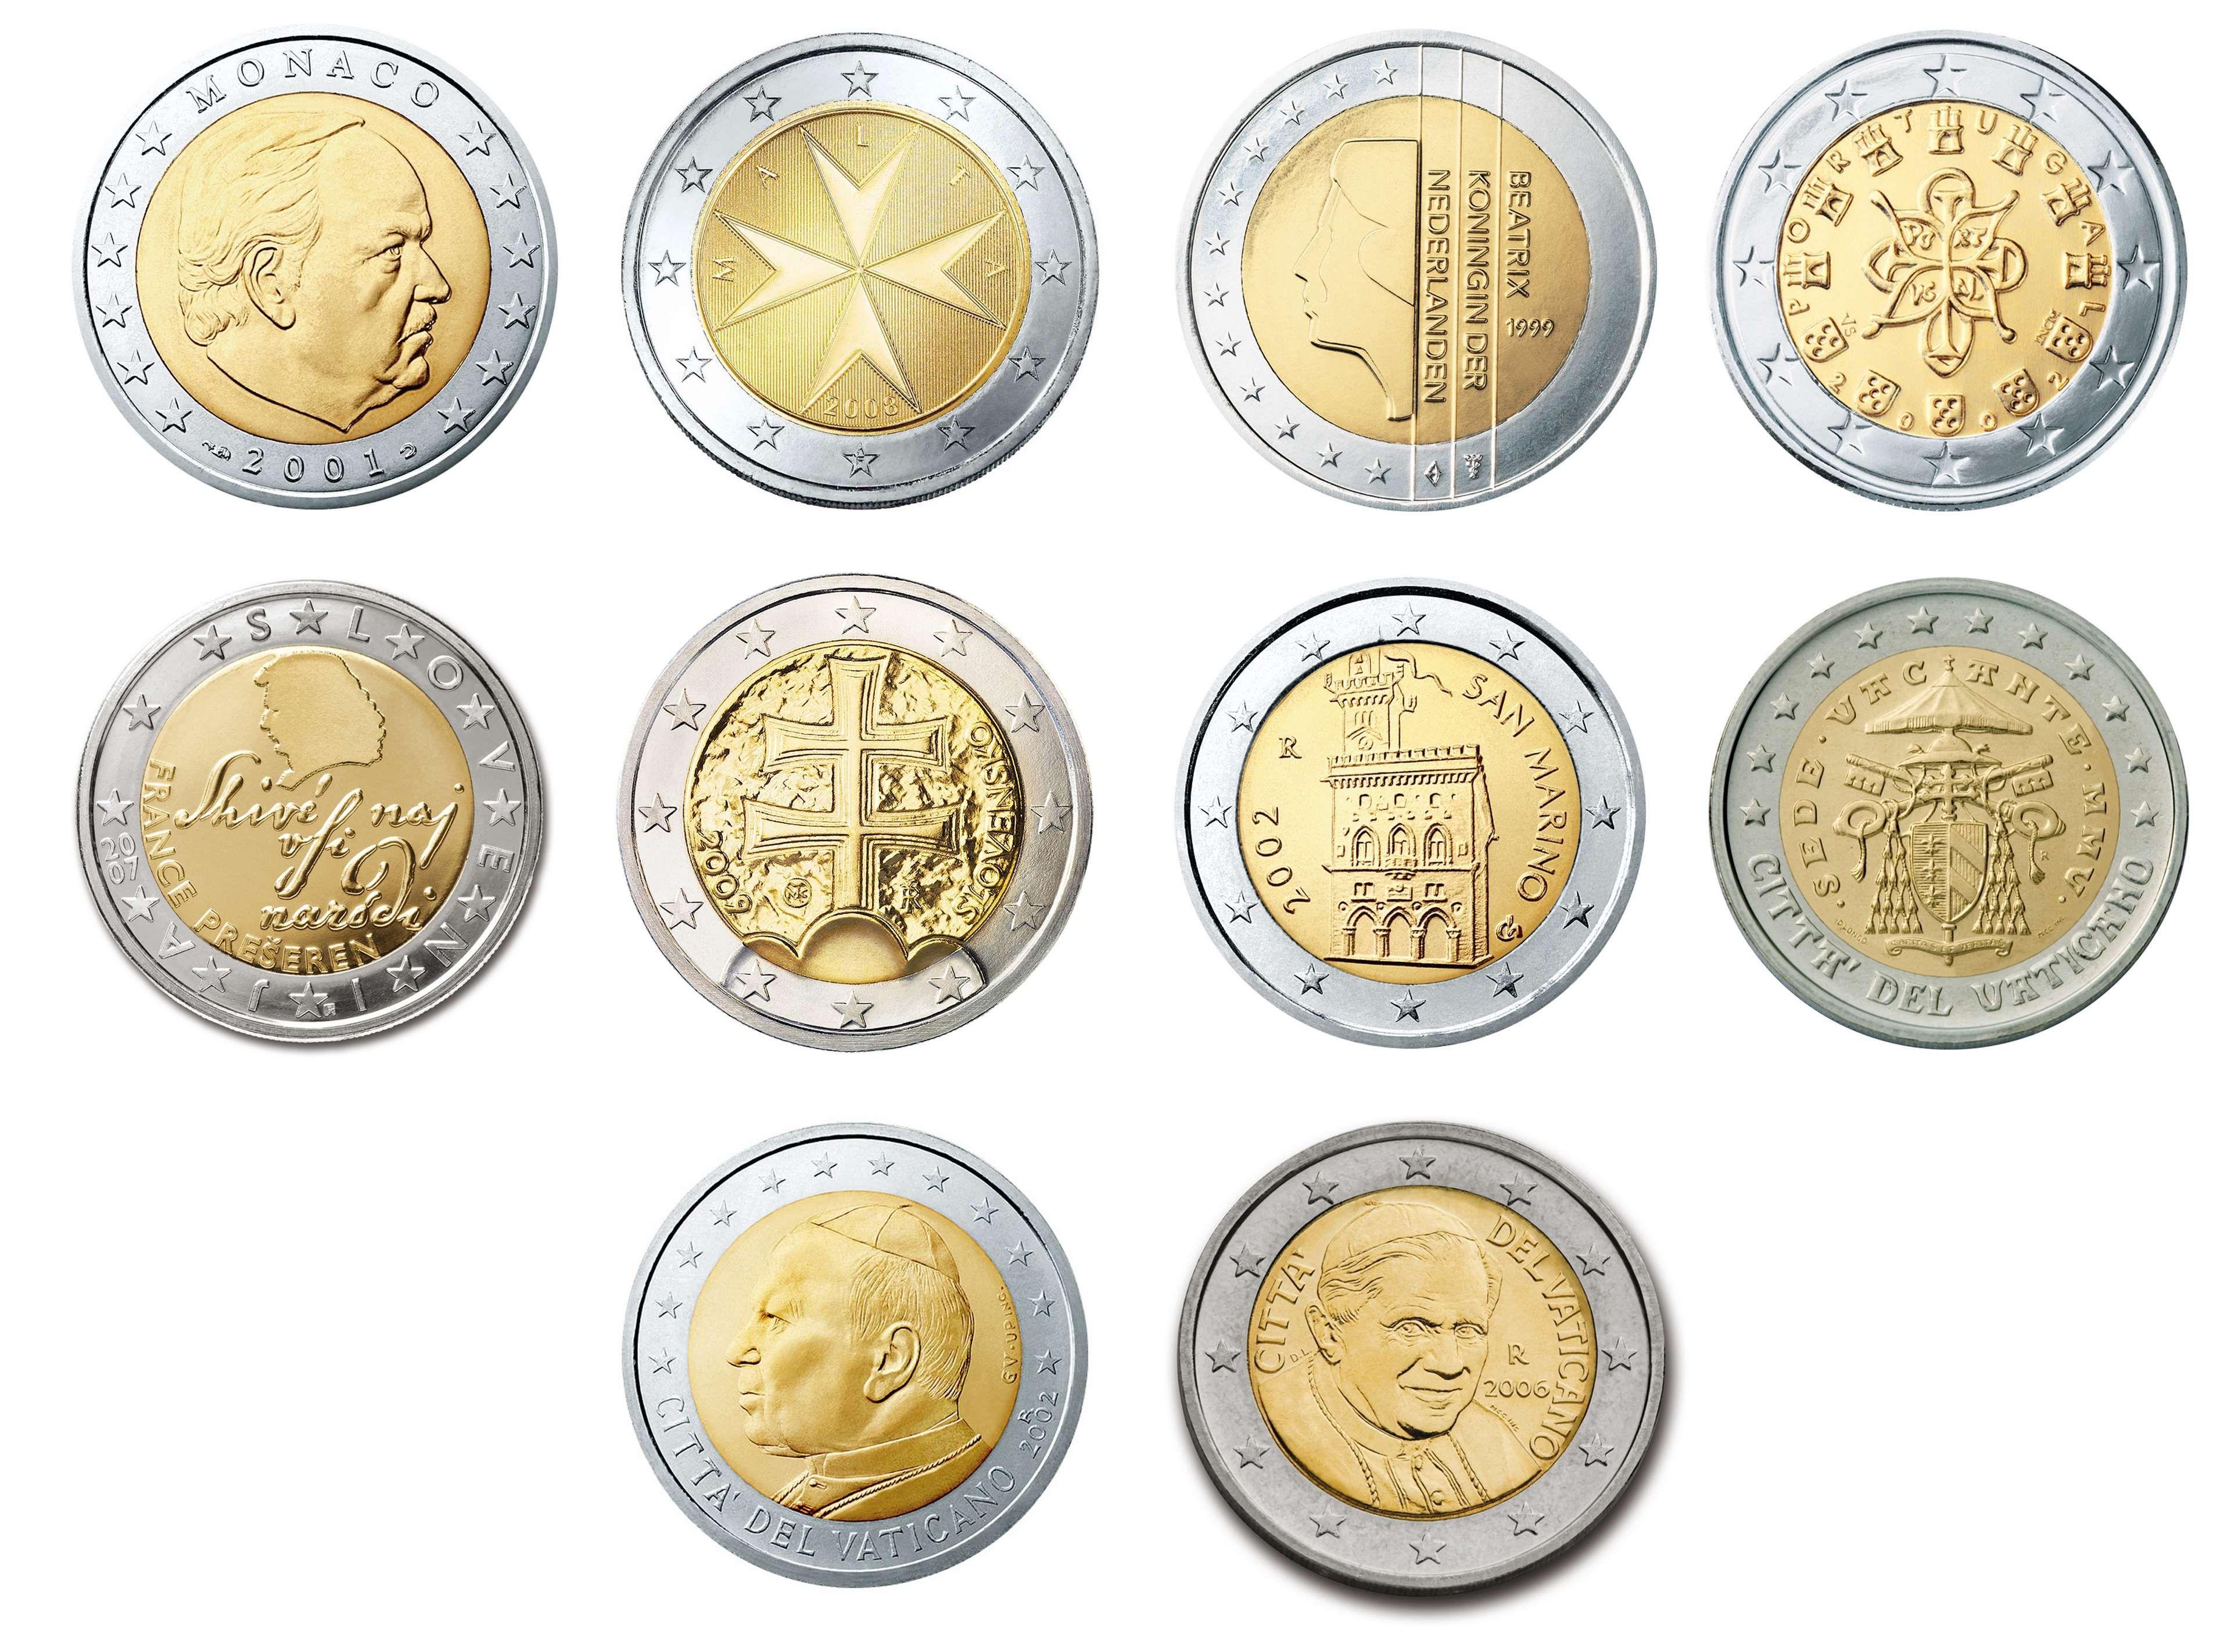 Money-laundering enquiries jumped in 2017 | Monaco Life